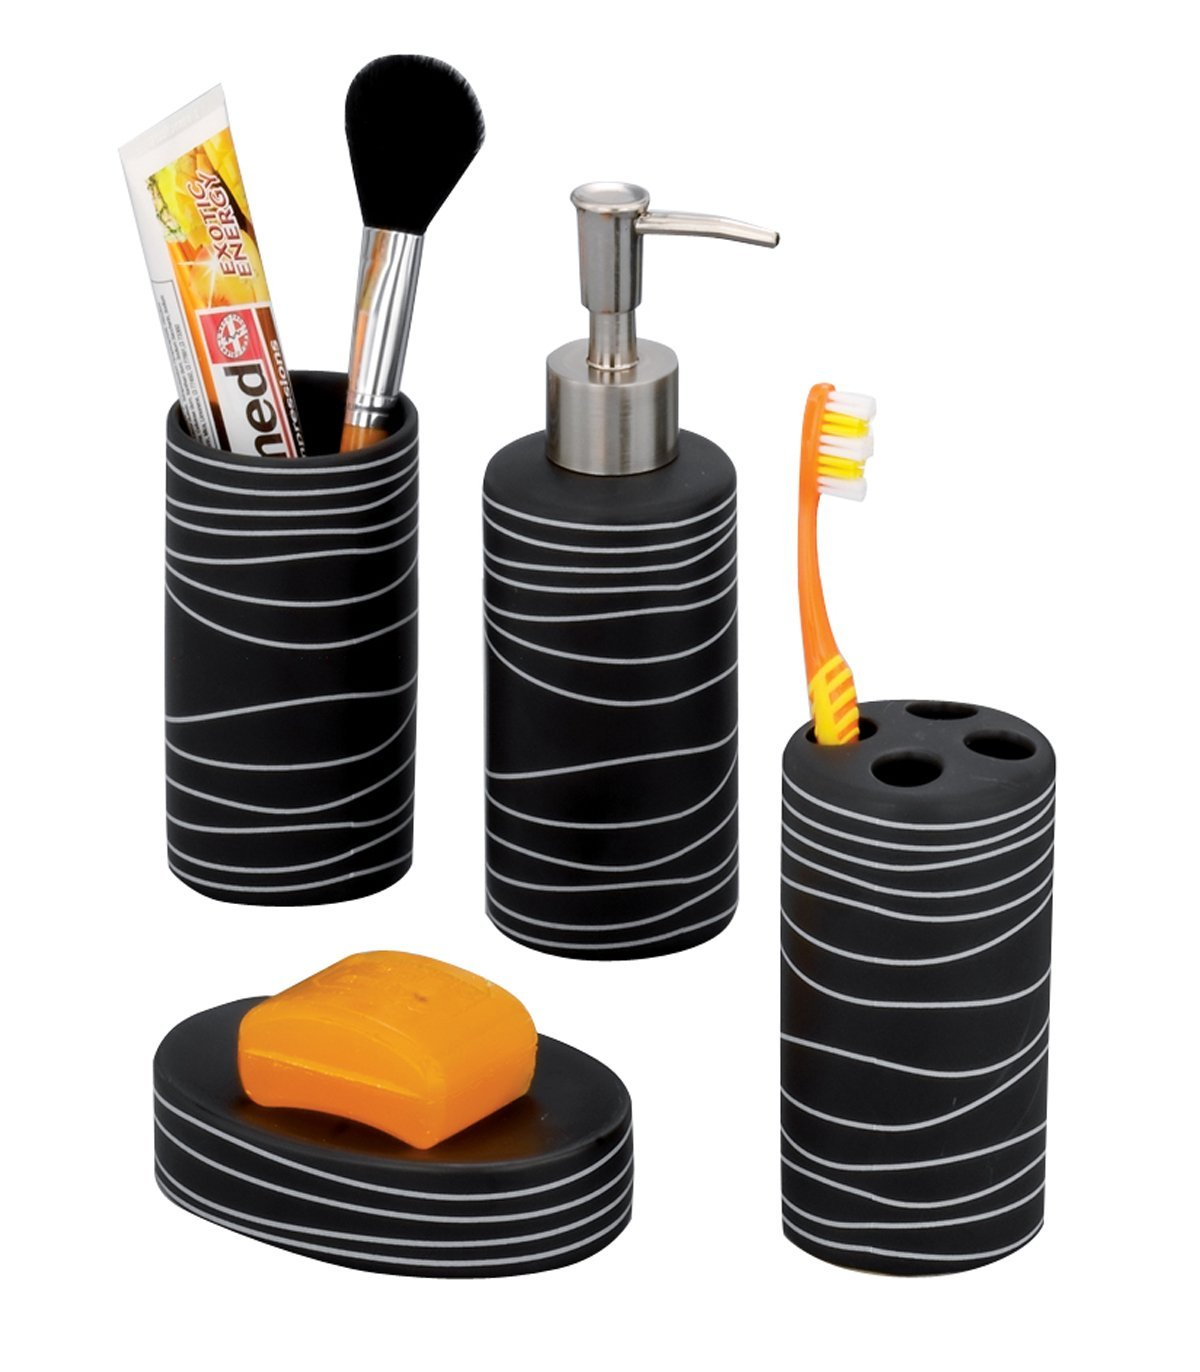 Juego de accesorios para baño de cerámica Zeller negro